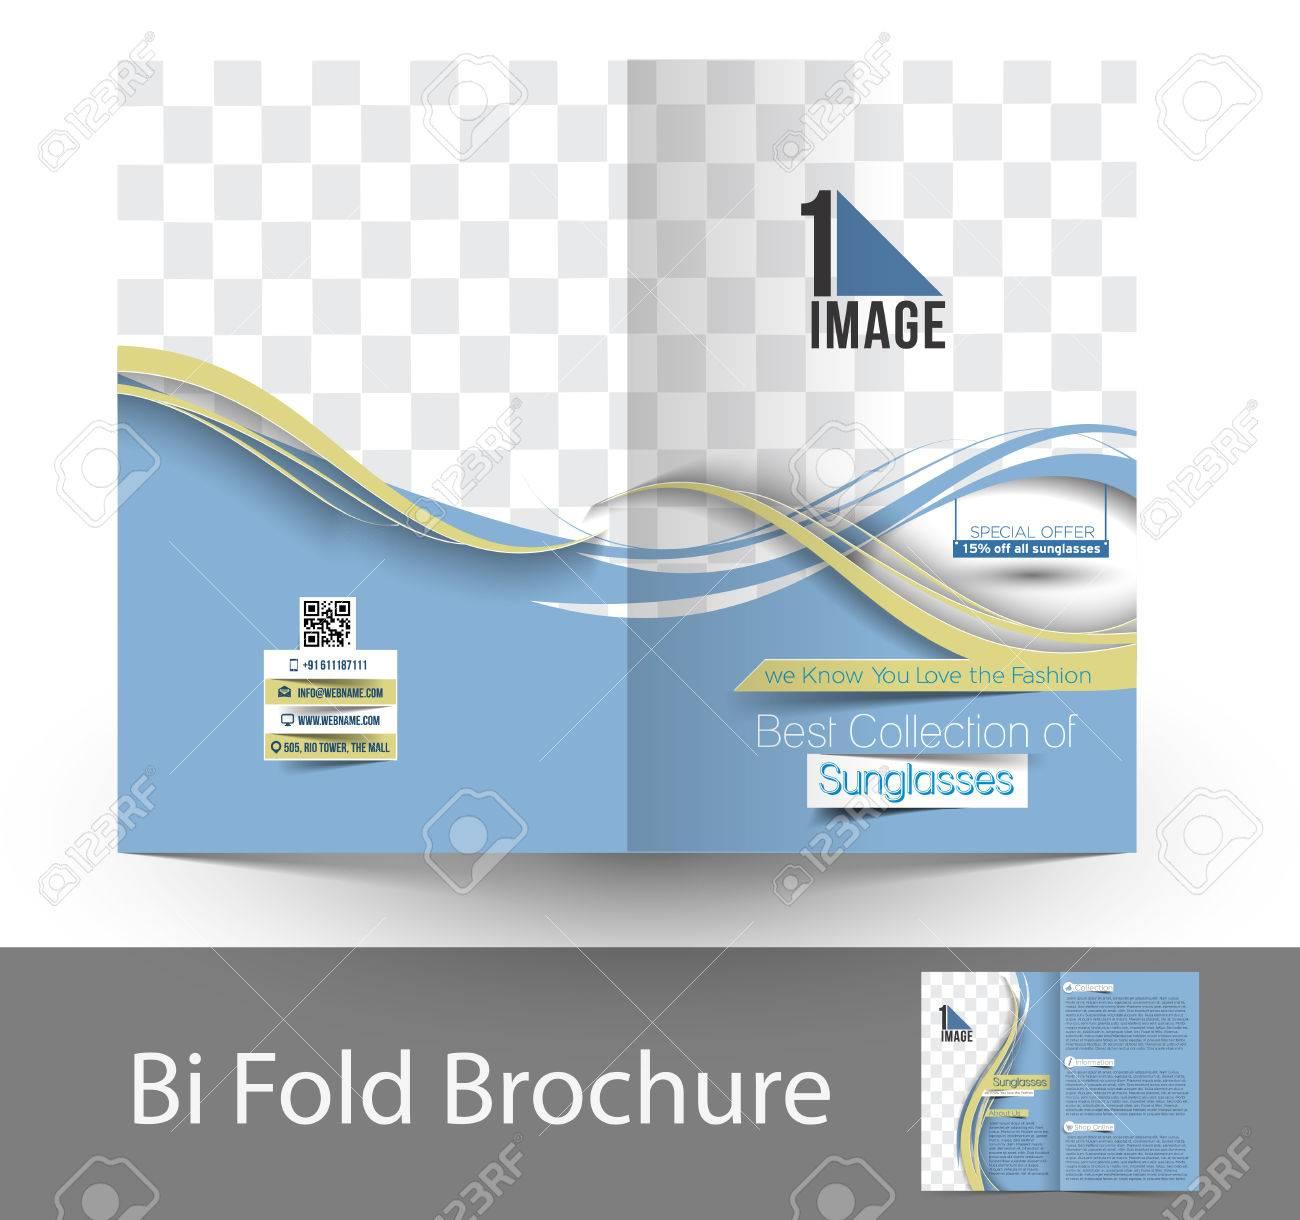 3a1048a70ca Optician Sunglasses Store Bi-Fold Mock up   Brochure Design Stock Vector -  38329138